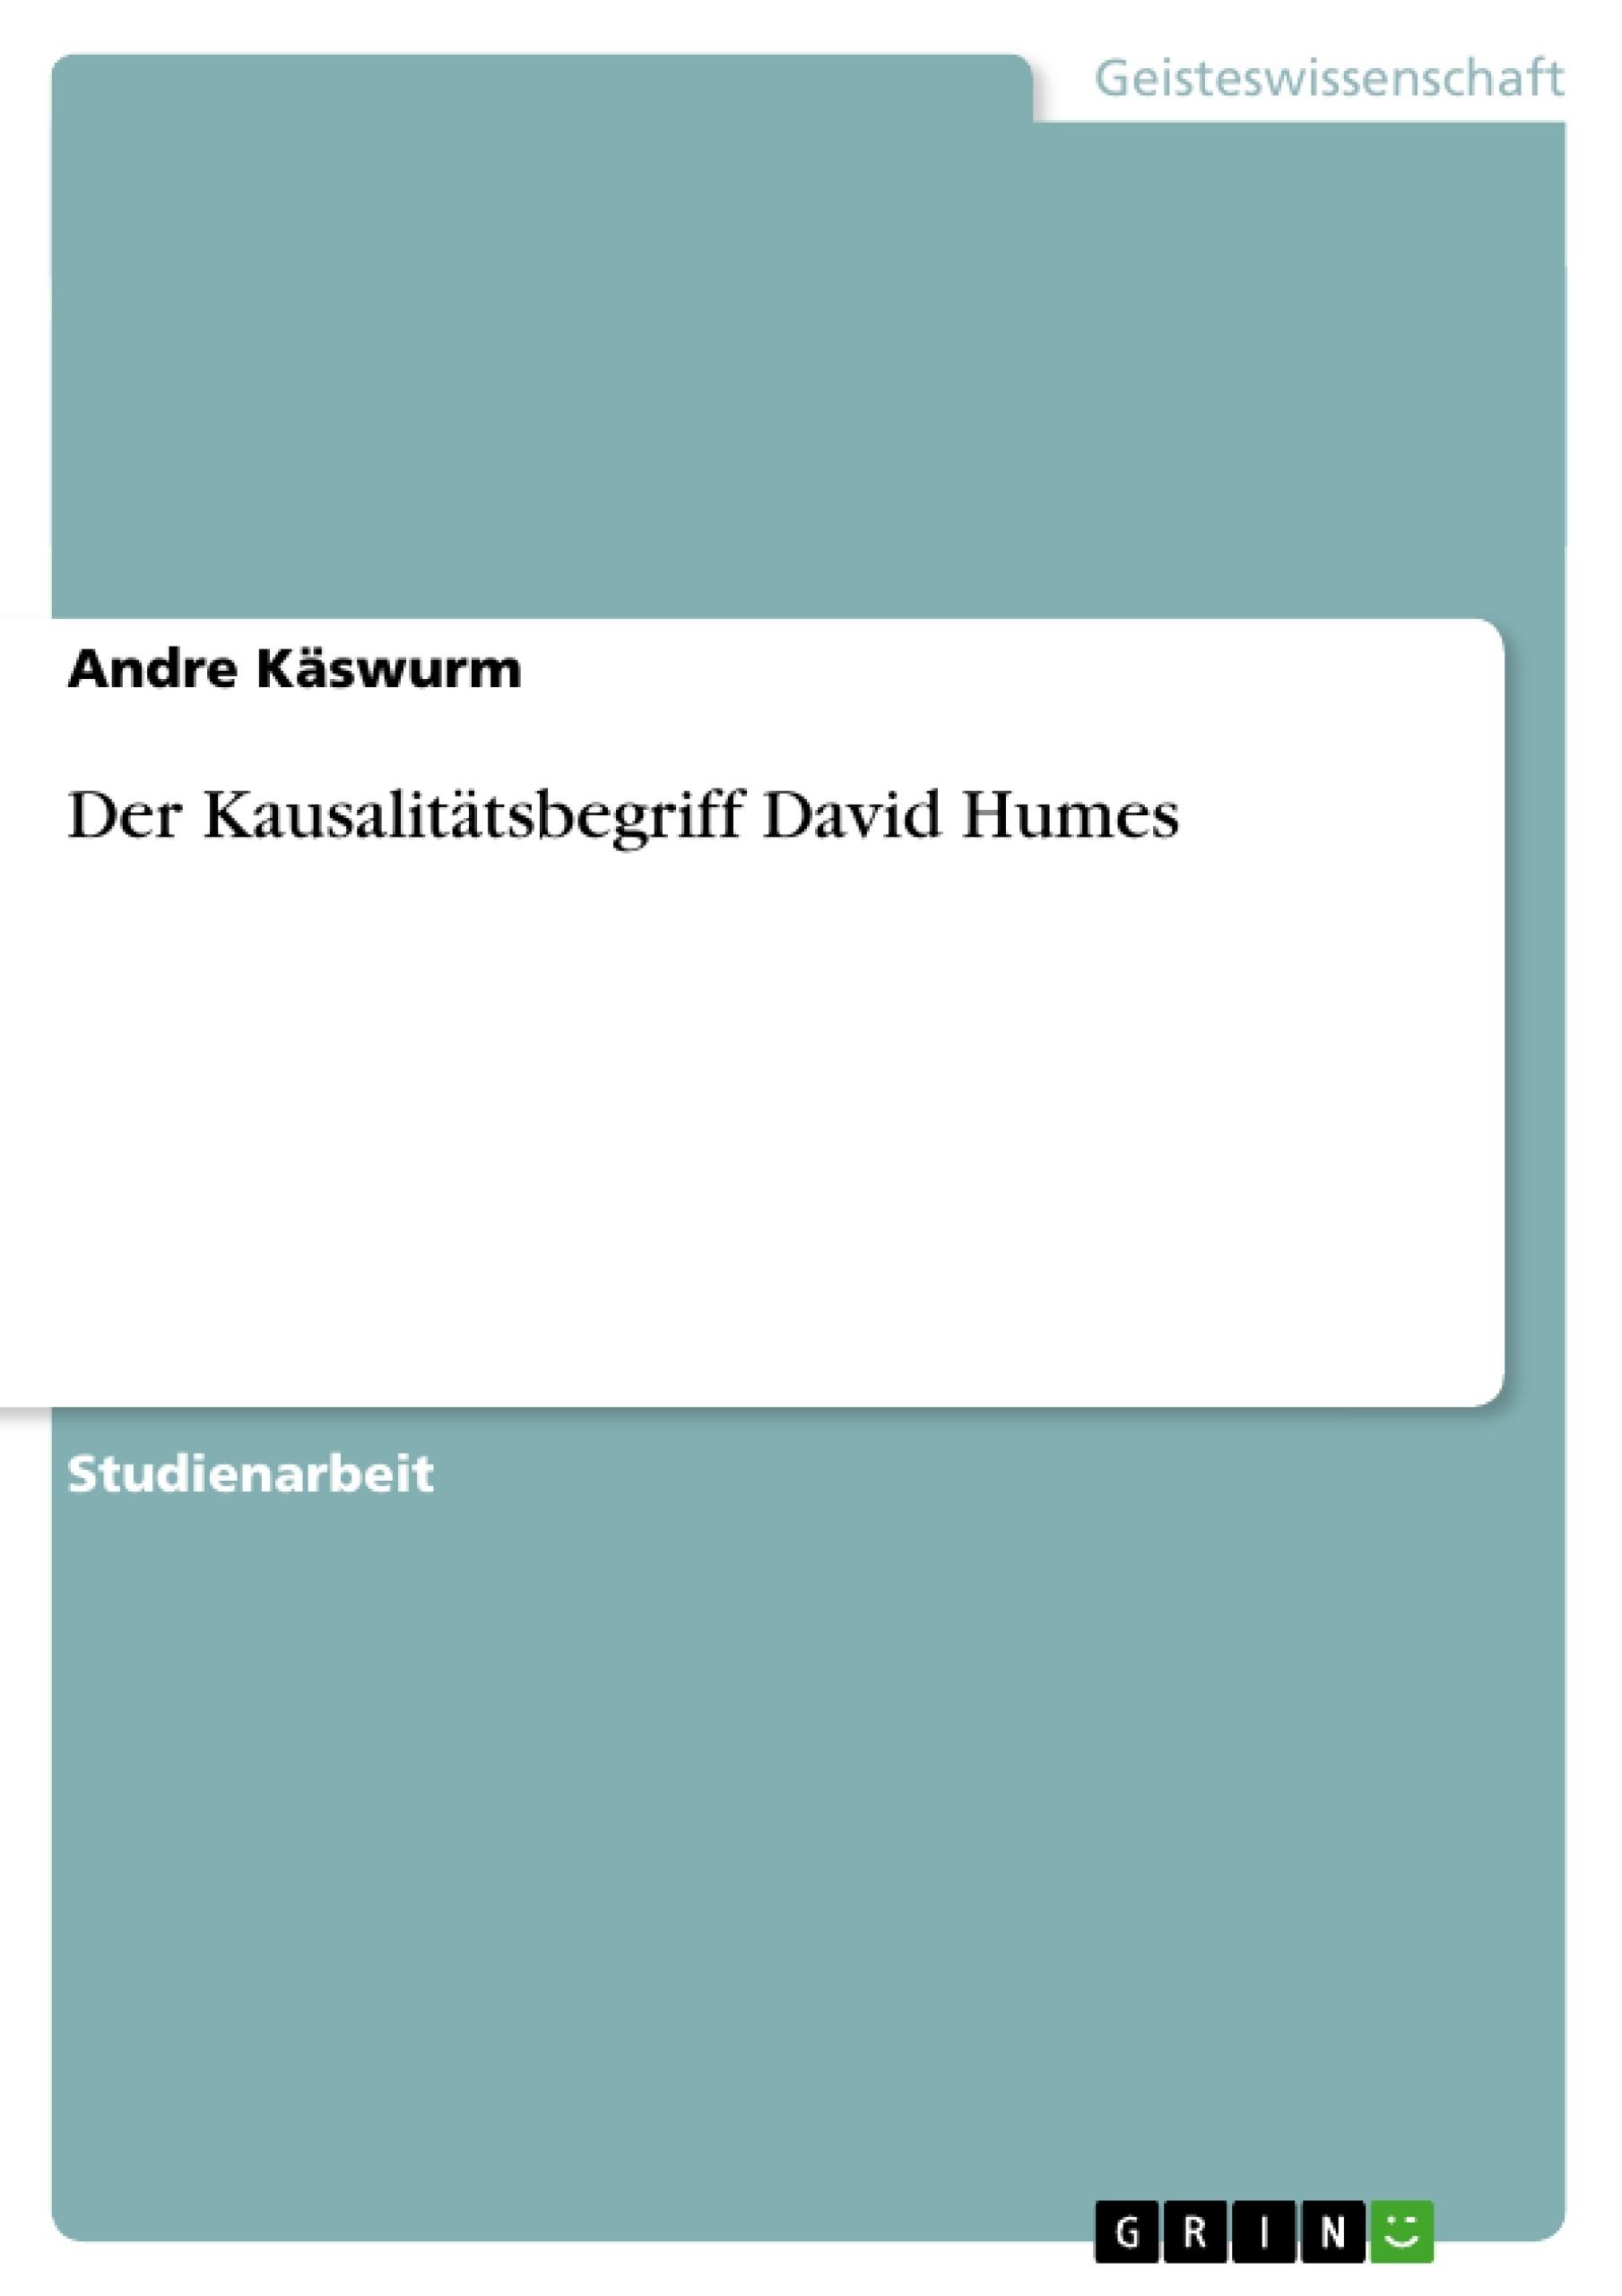 Titel: Der Kausalitätsbegriff David Humes